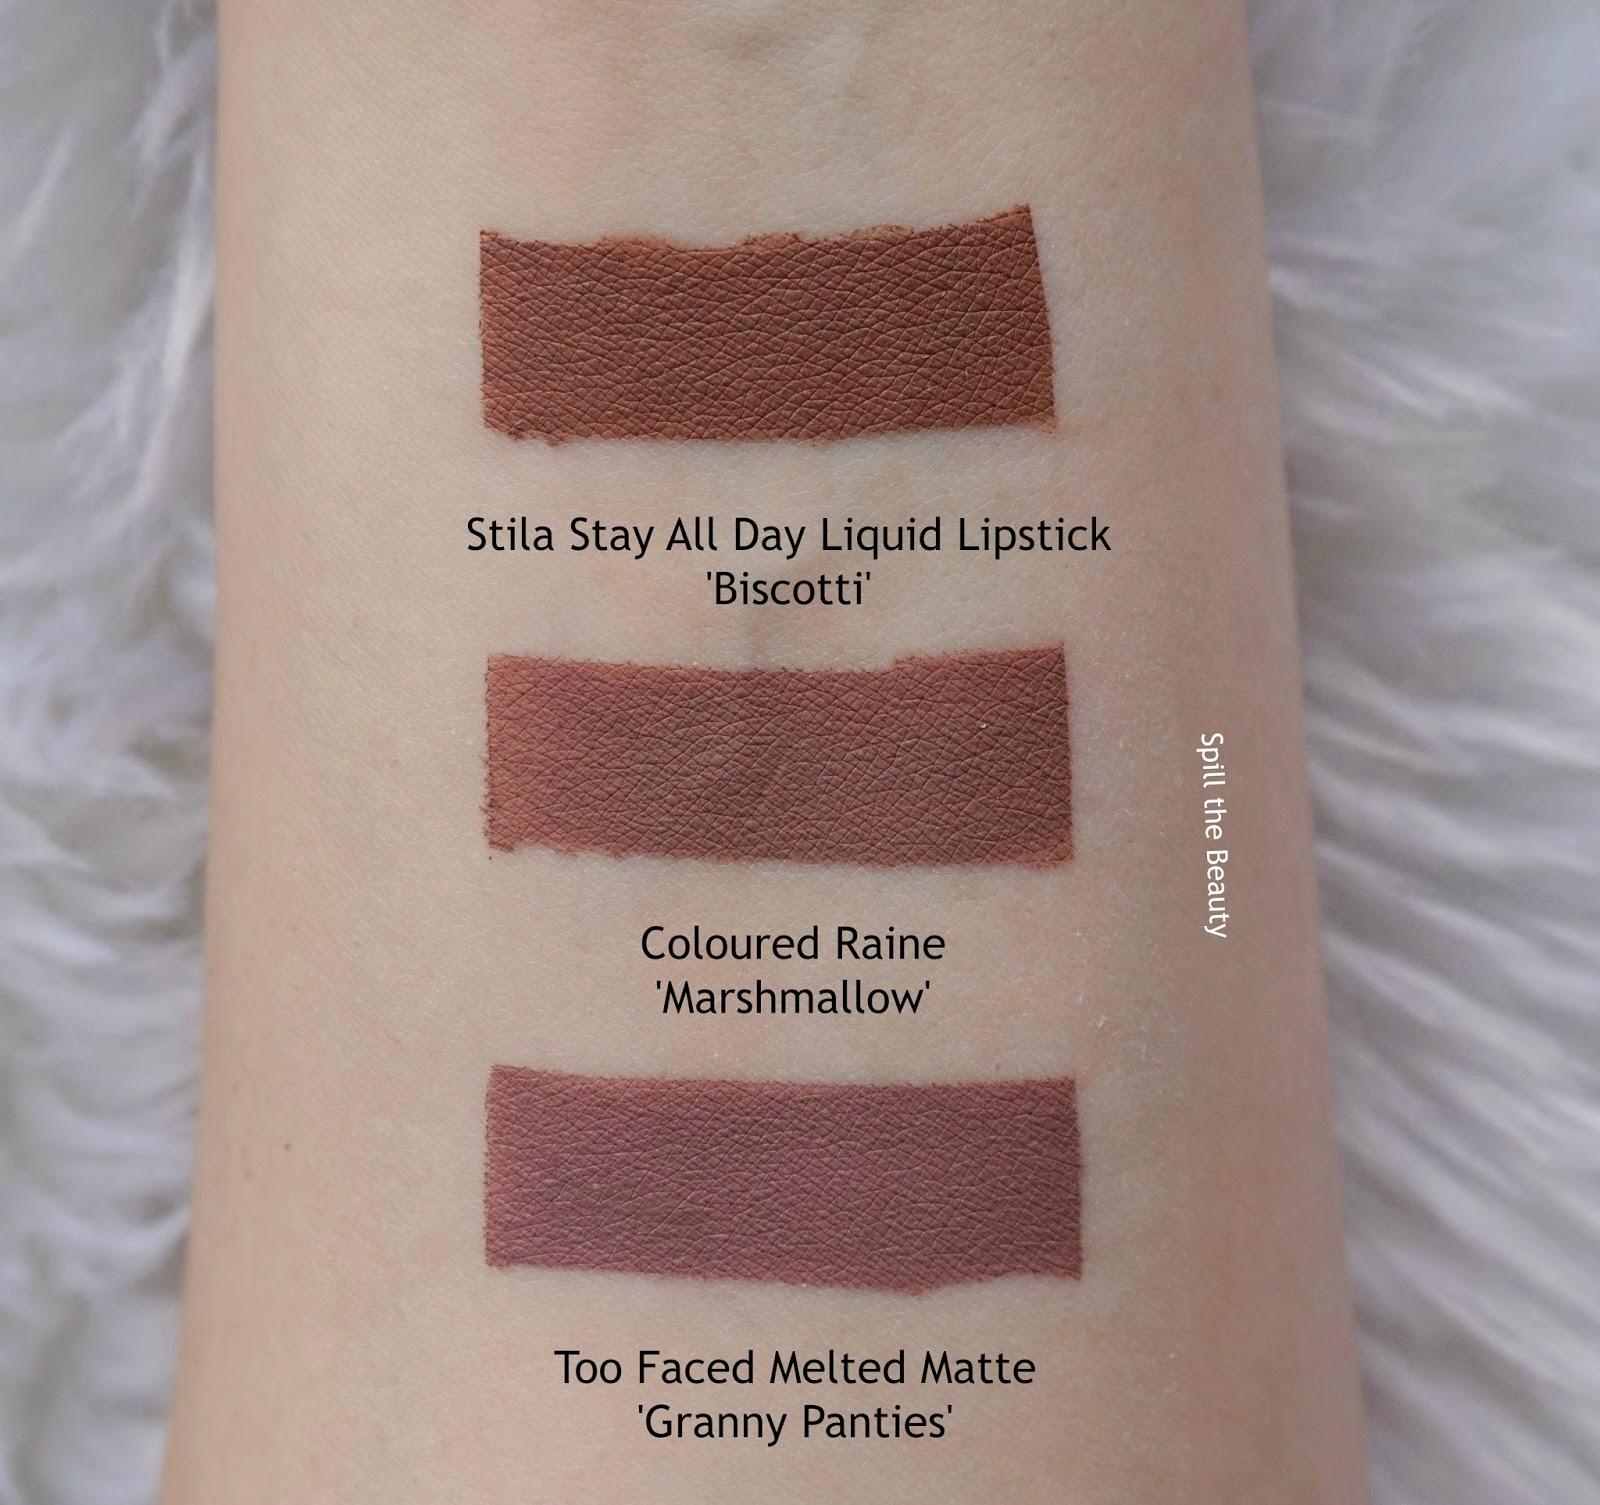 lip swatch coloured raine comparison dupe stila biscotti too faced granny panties